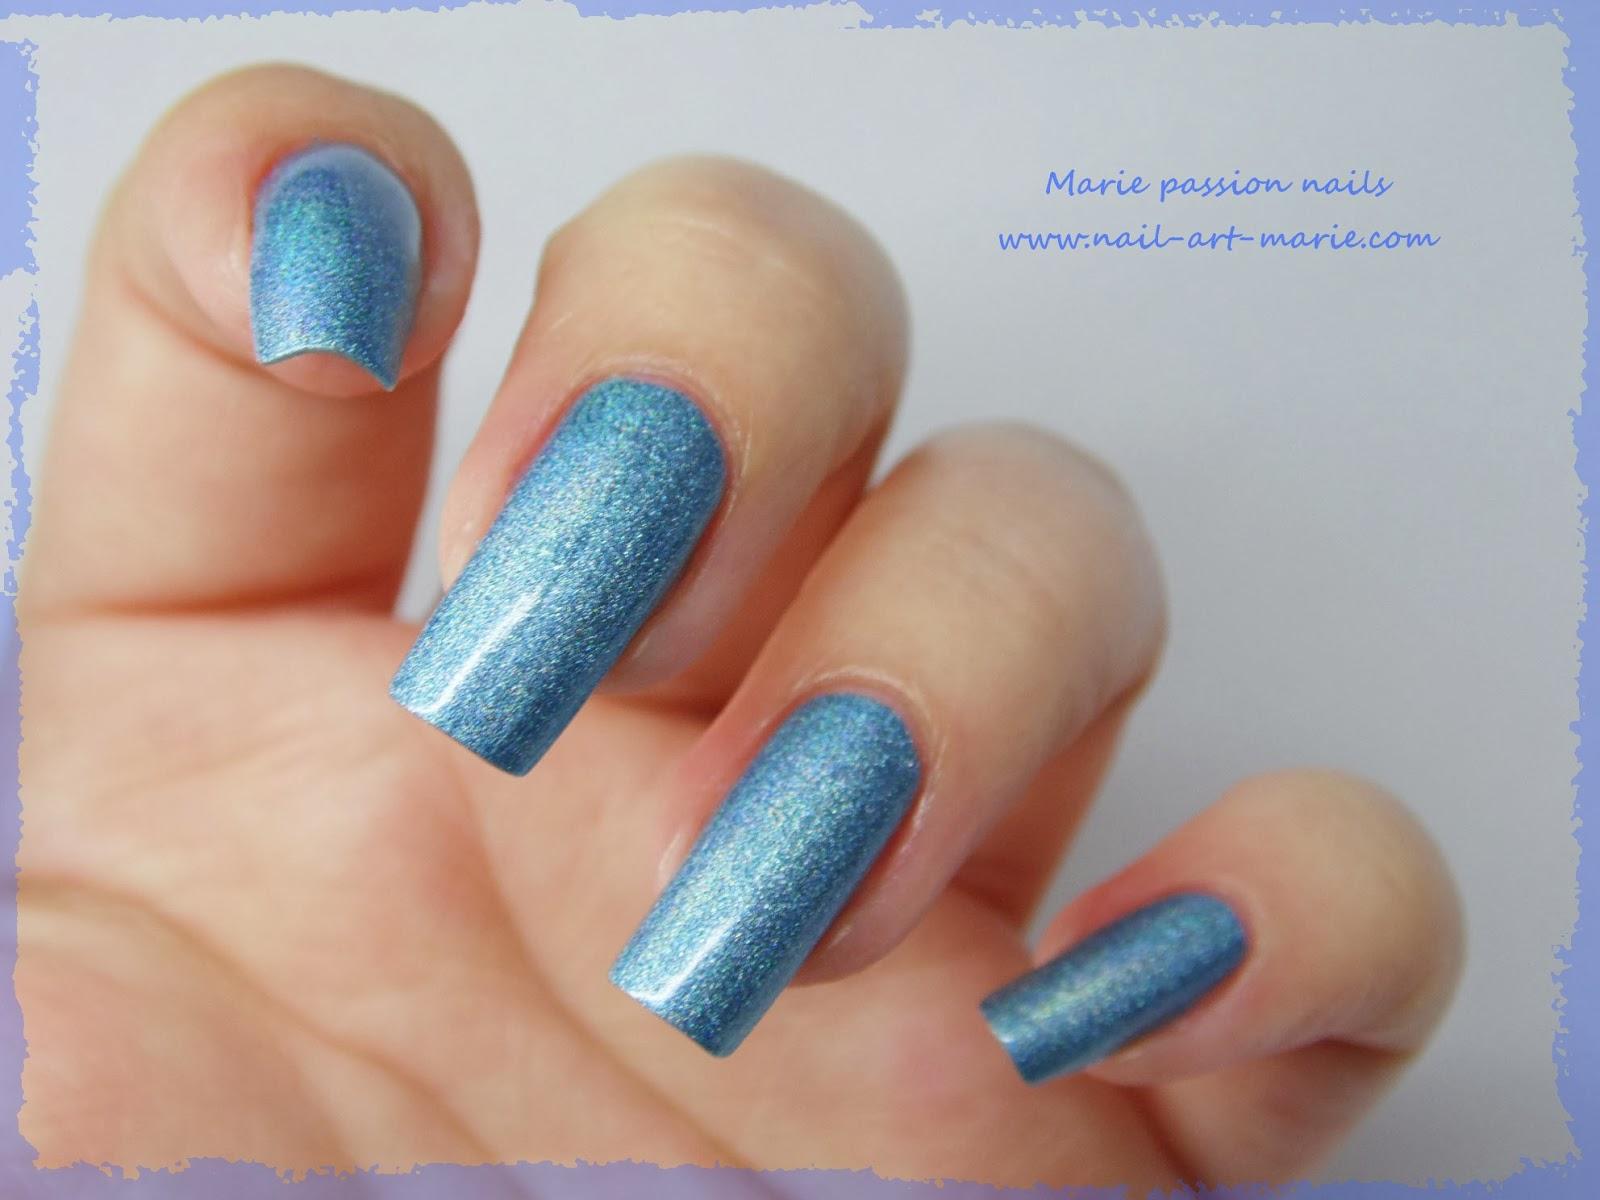 LM Cosmetic Nunki5